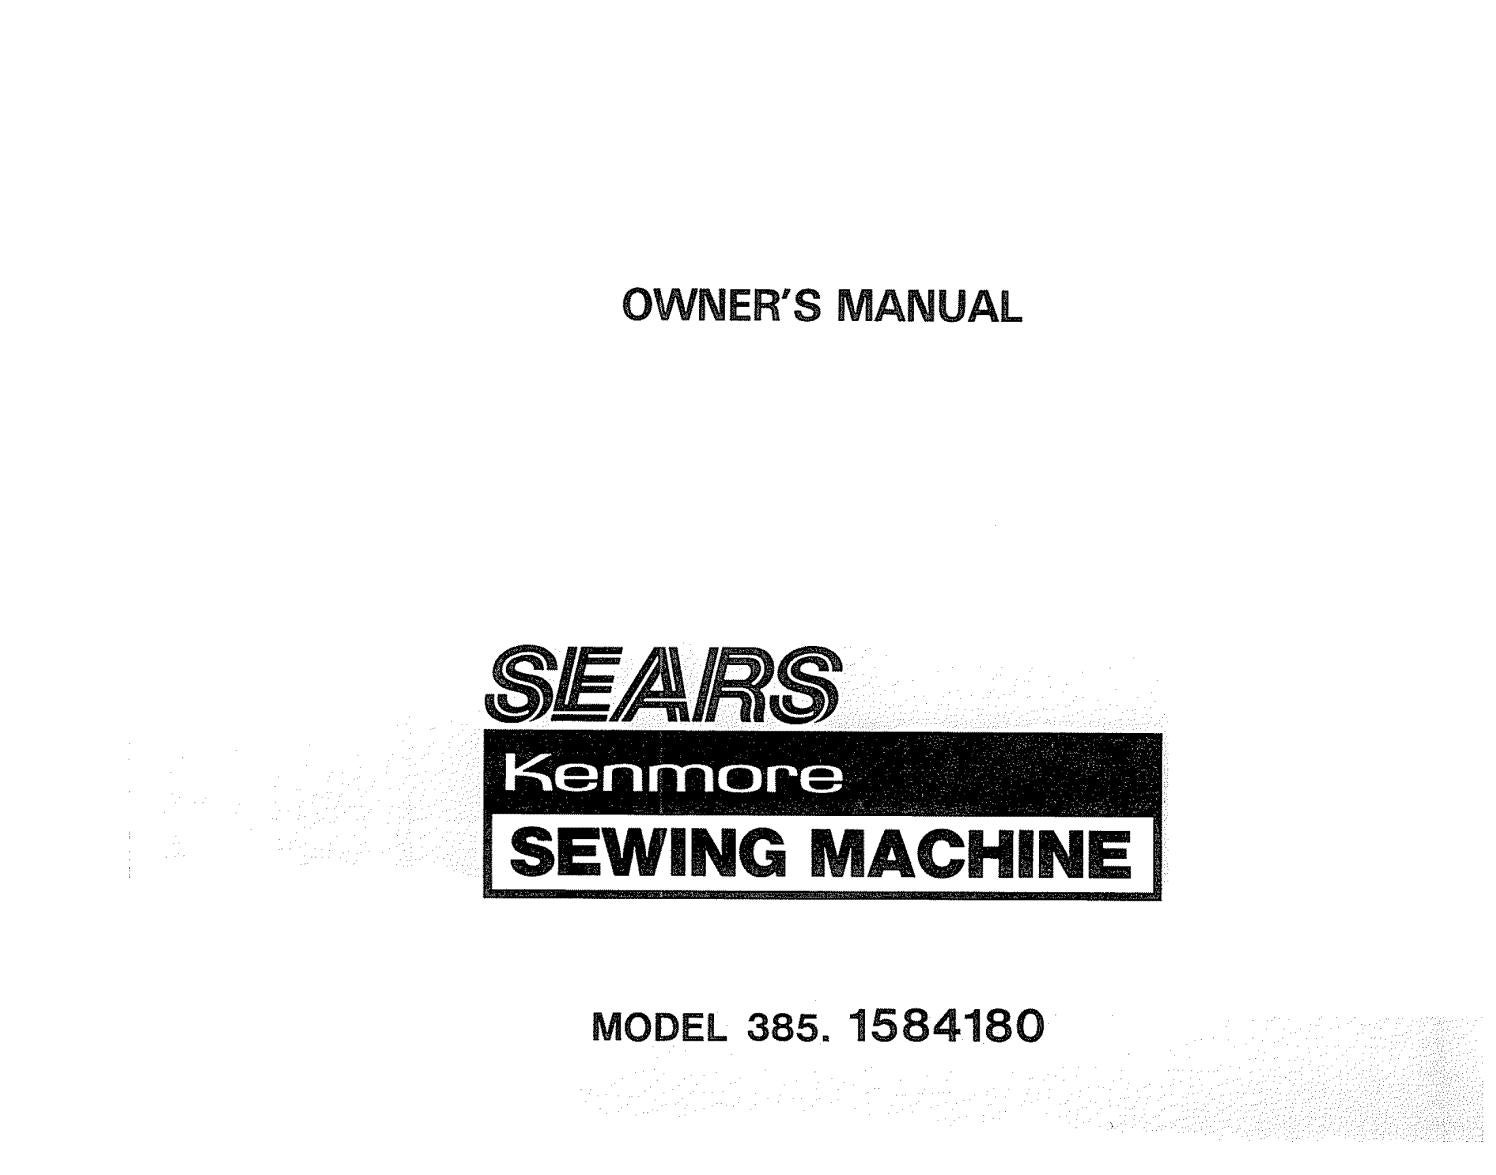 Kenmore 385 1584180 Sewing Machine User Manual By David Mannock Issuu Parts Diagram